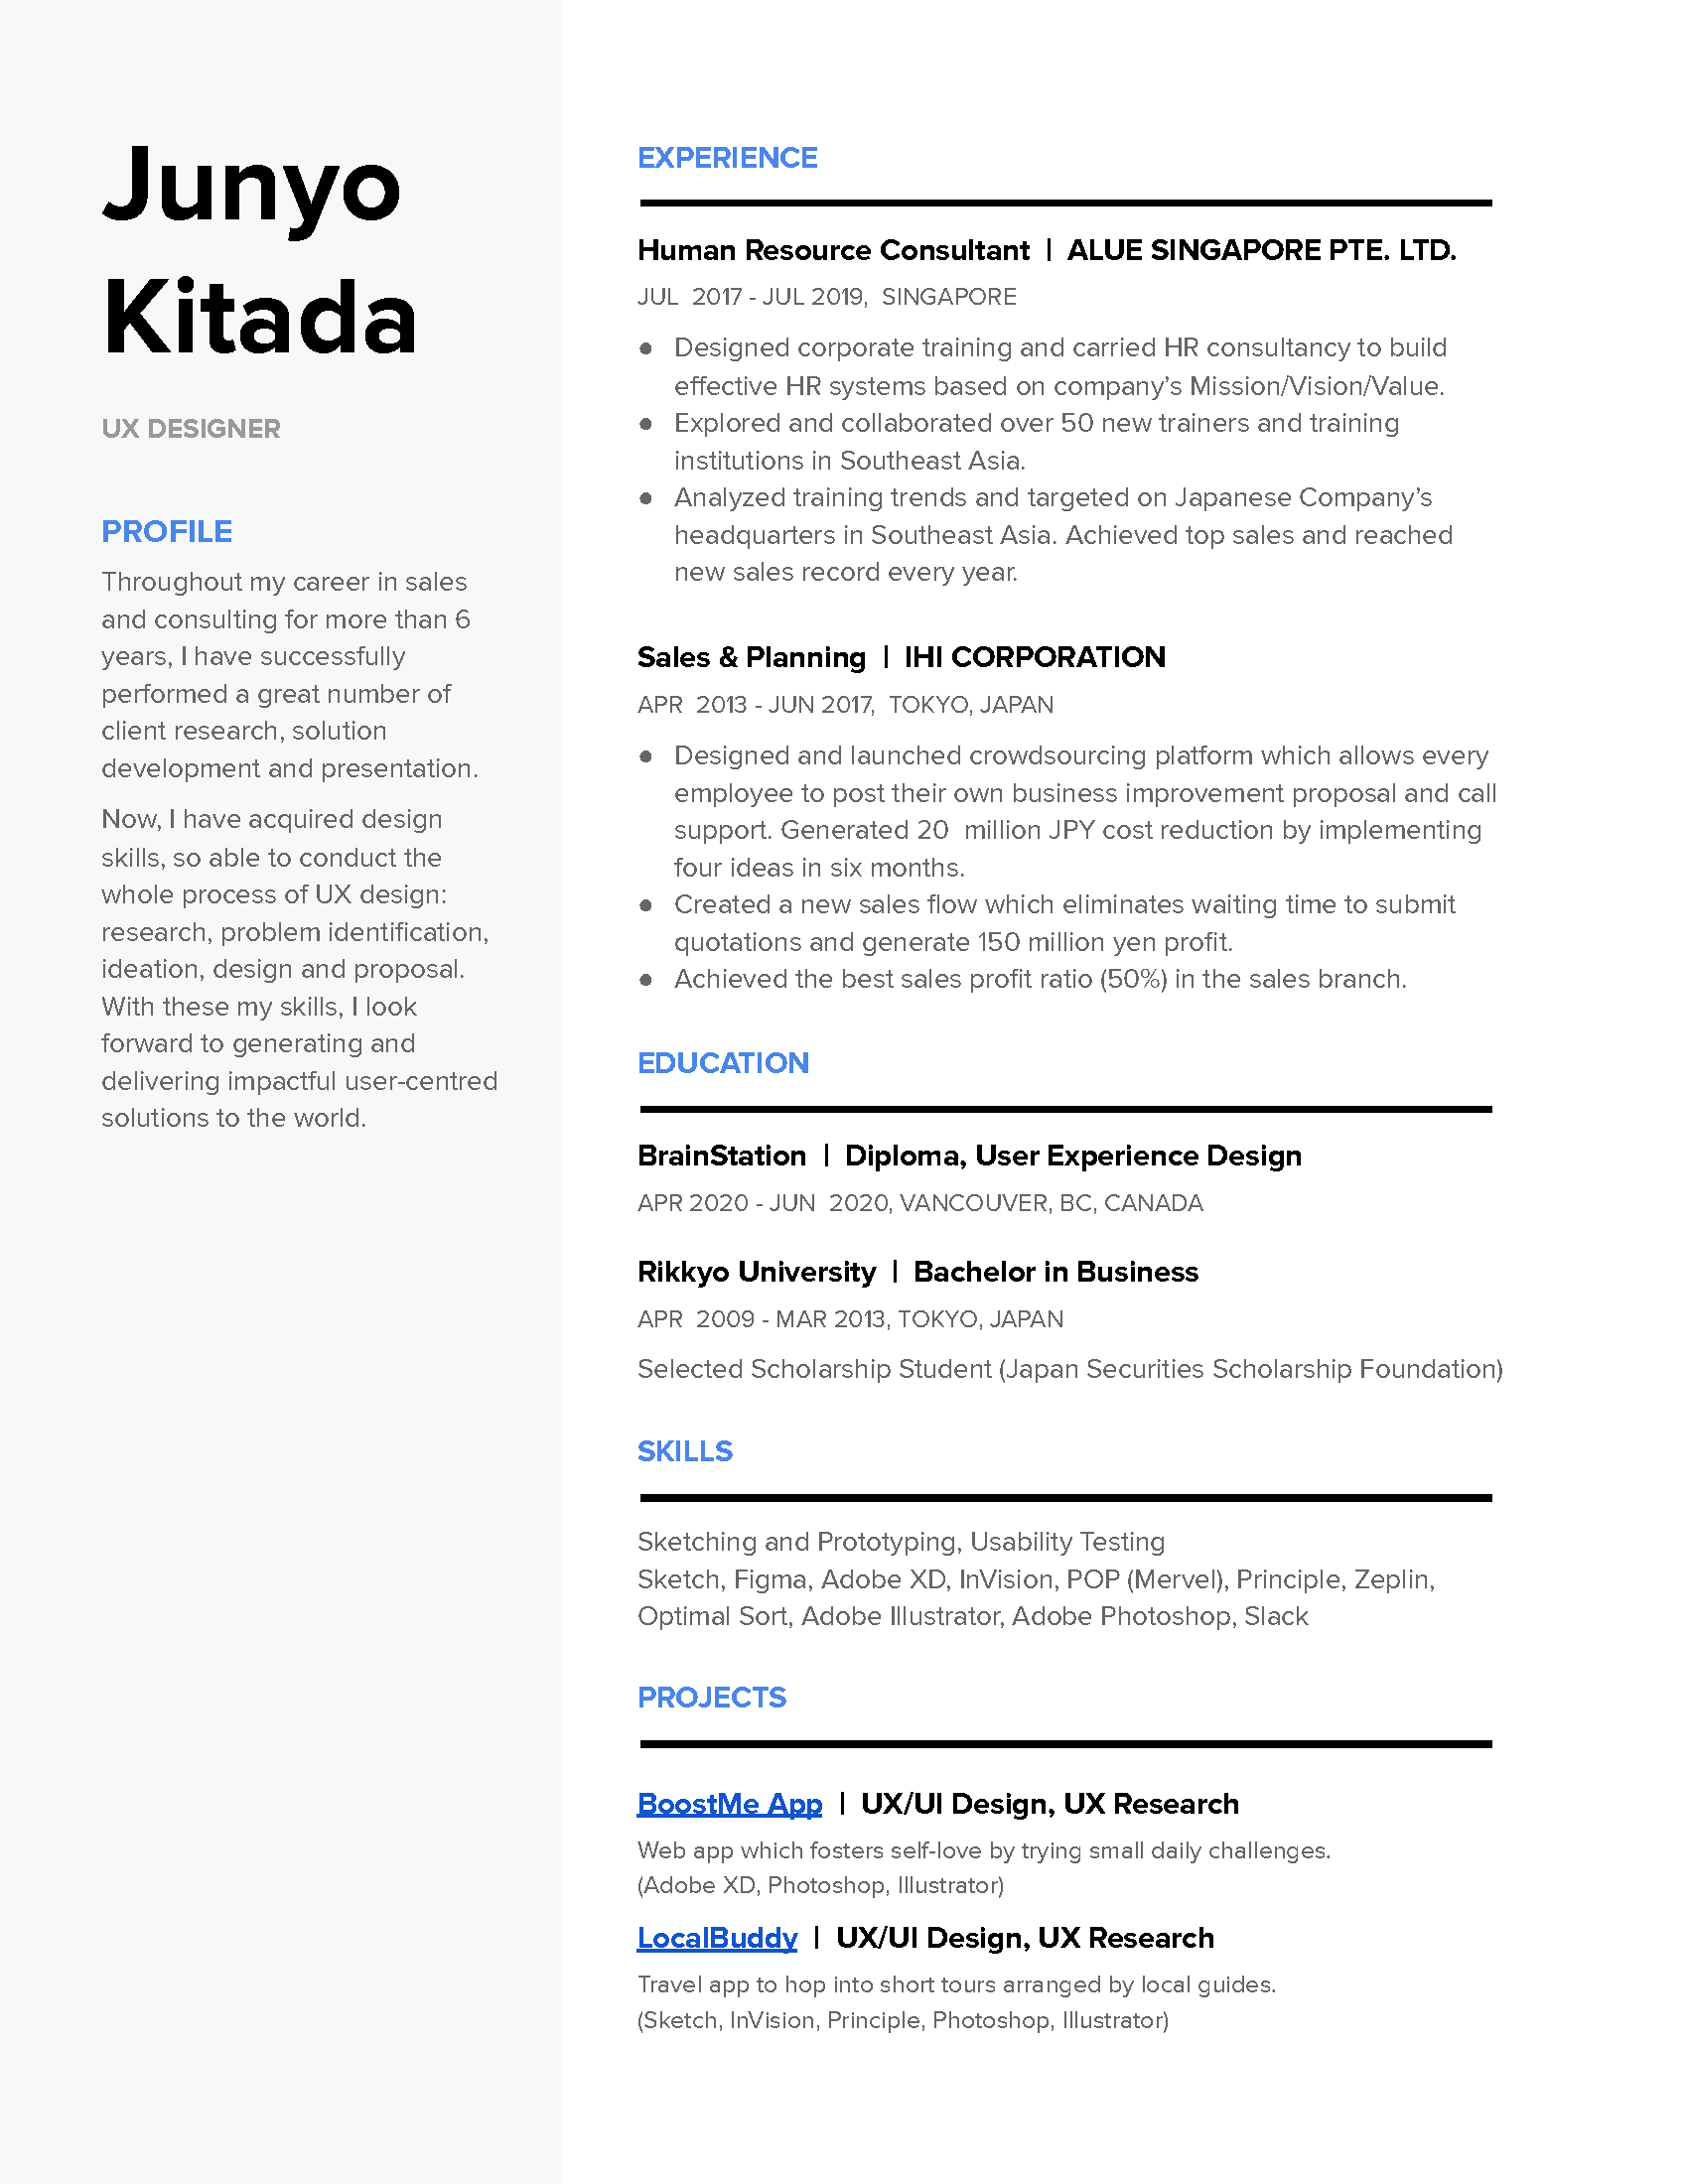 Resume_Junyo-Kitada_Portfolio_20211005